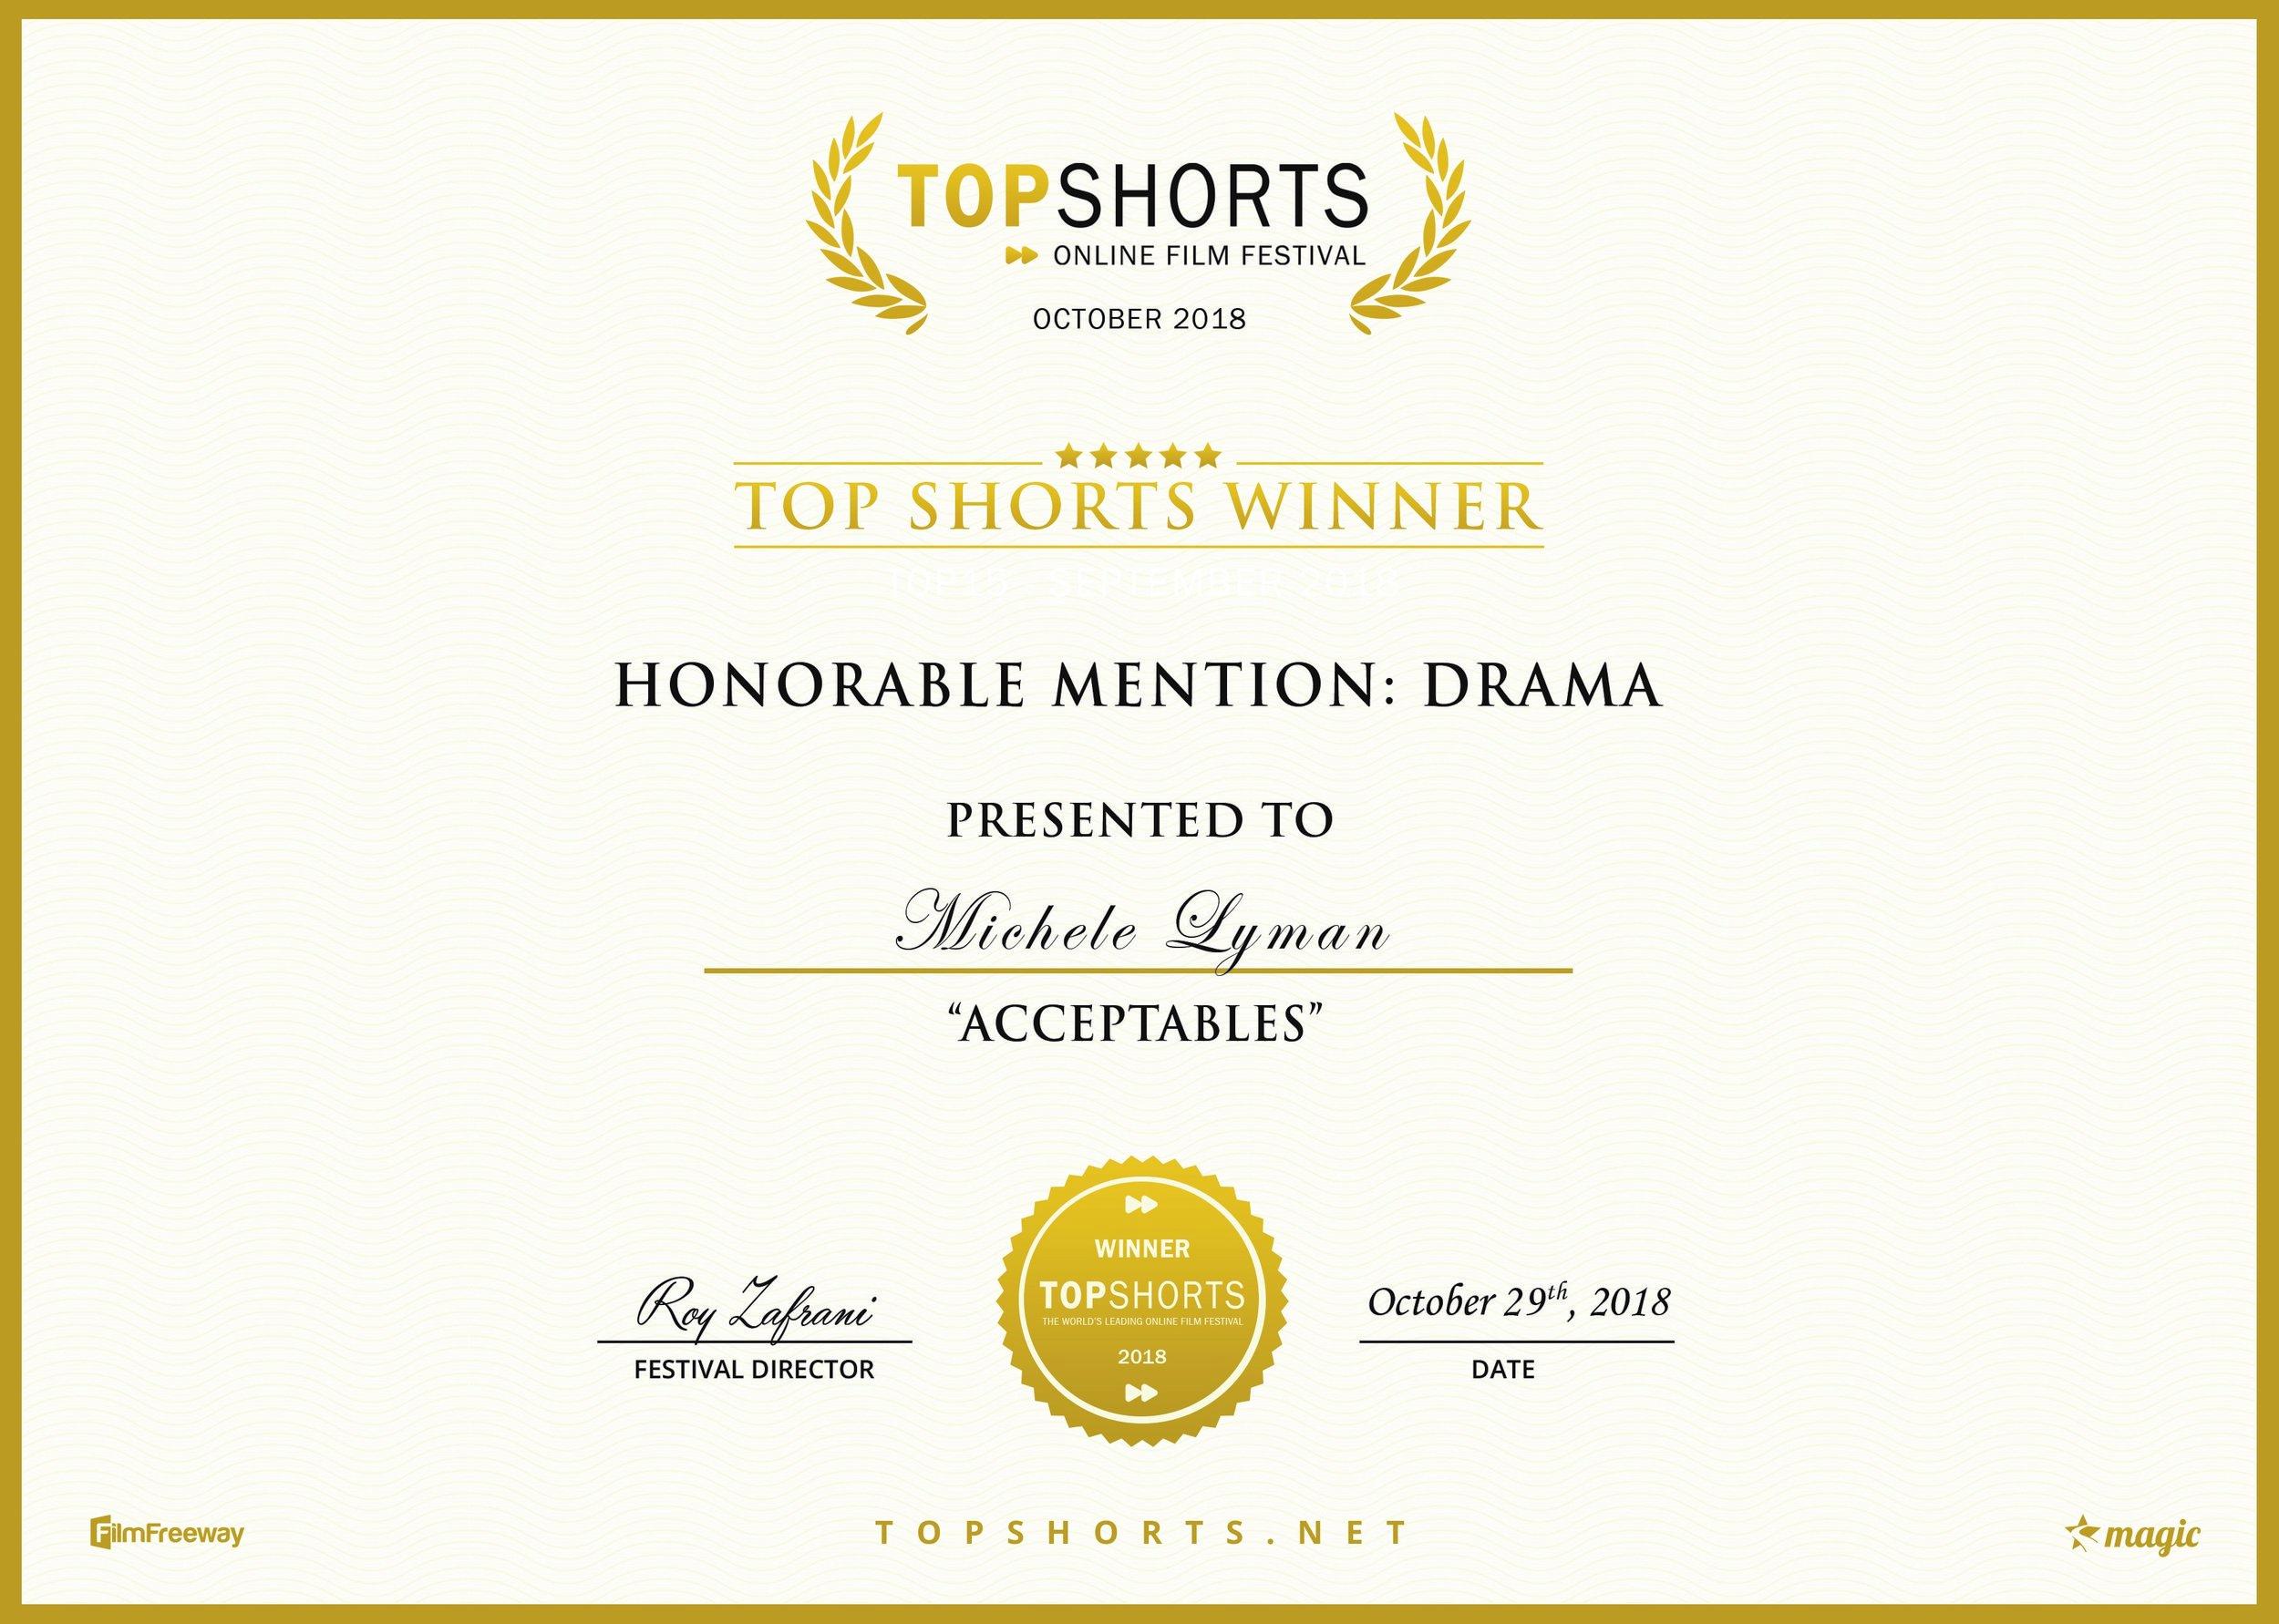 Top Shorts Honorable Mention Drama.jpg